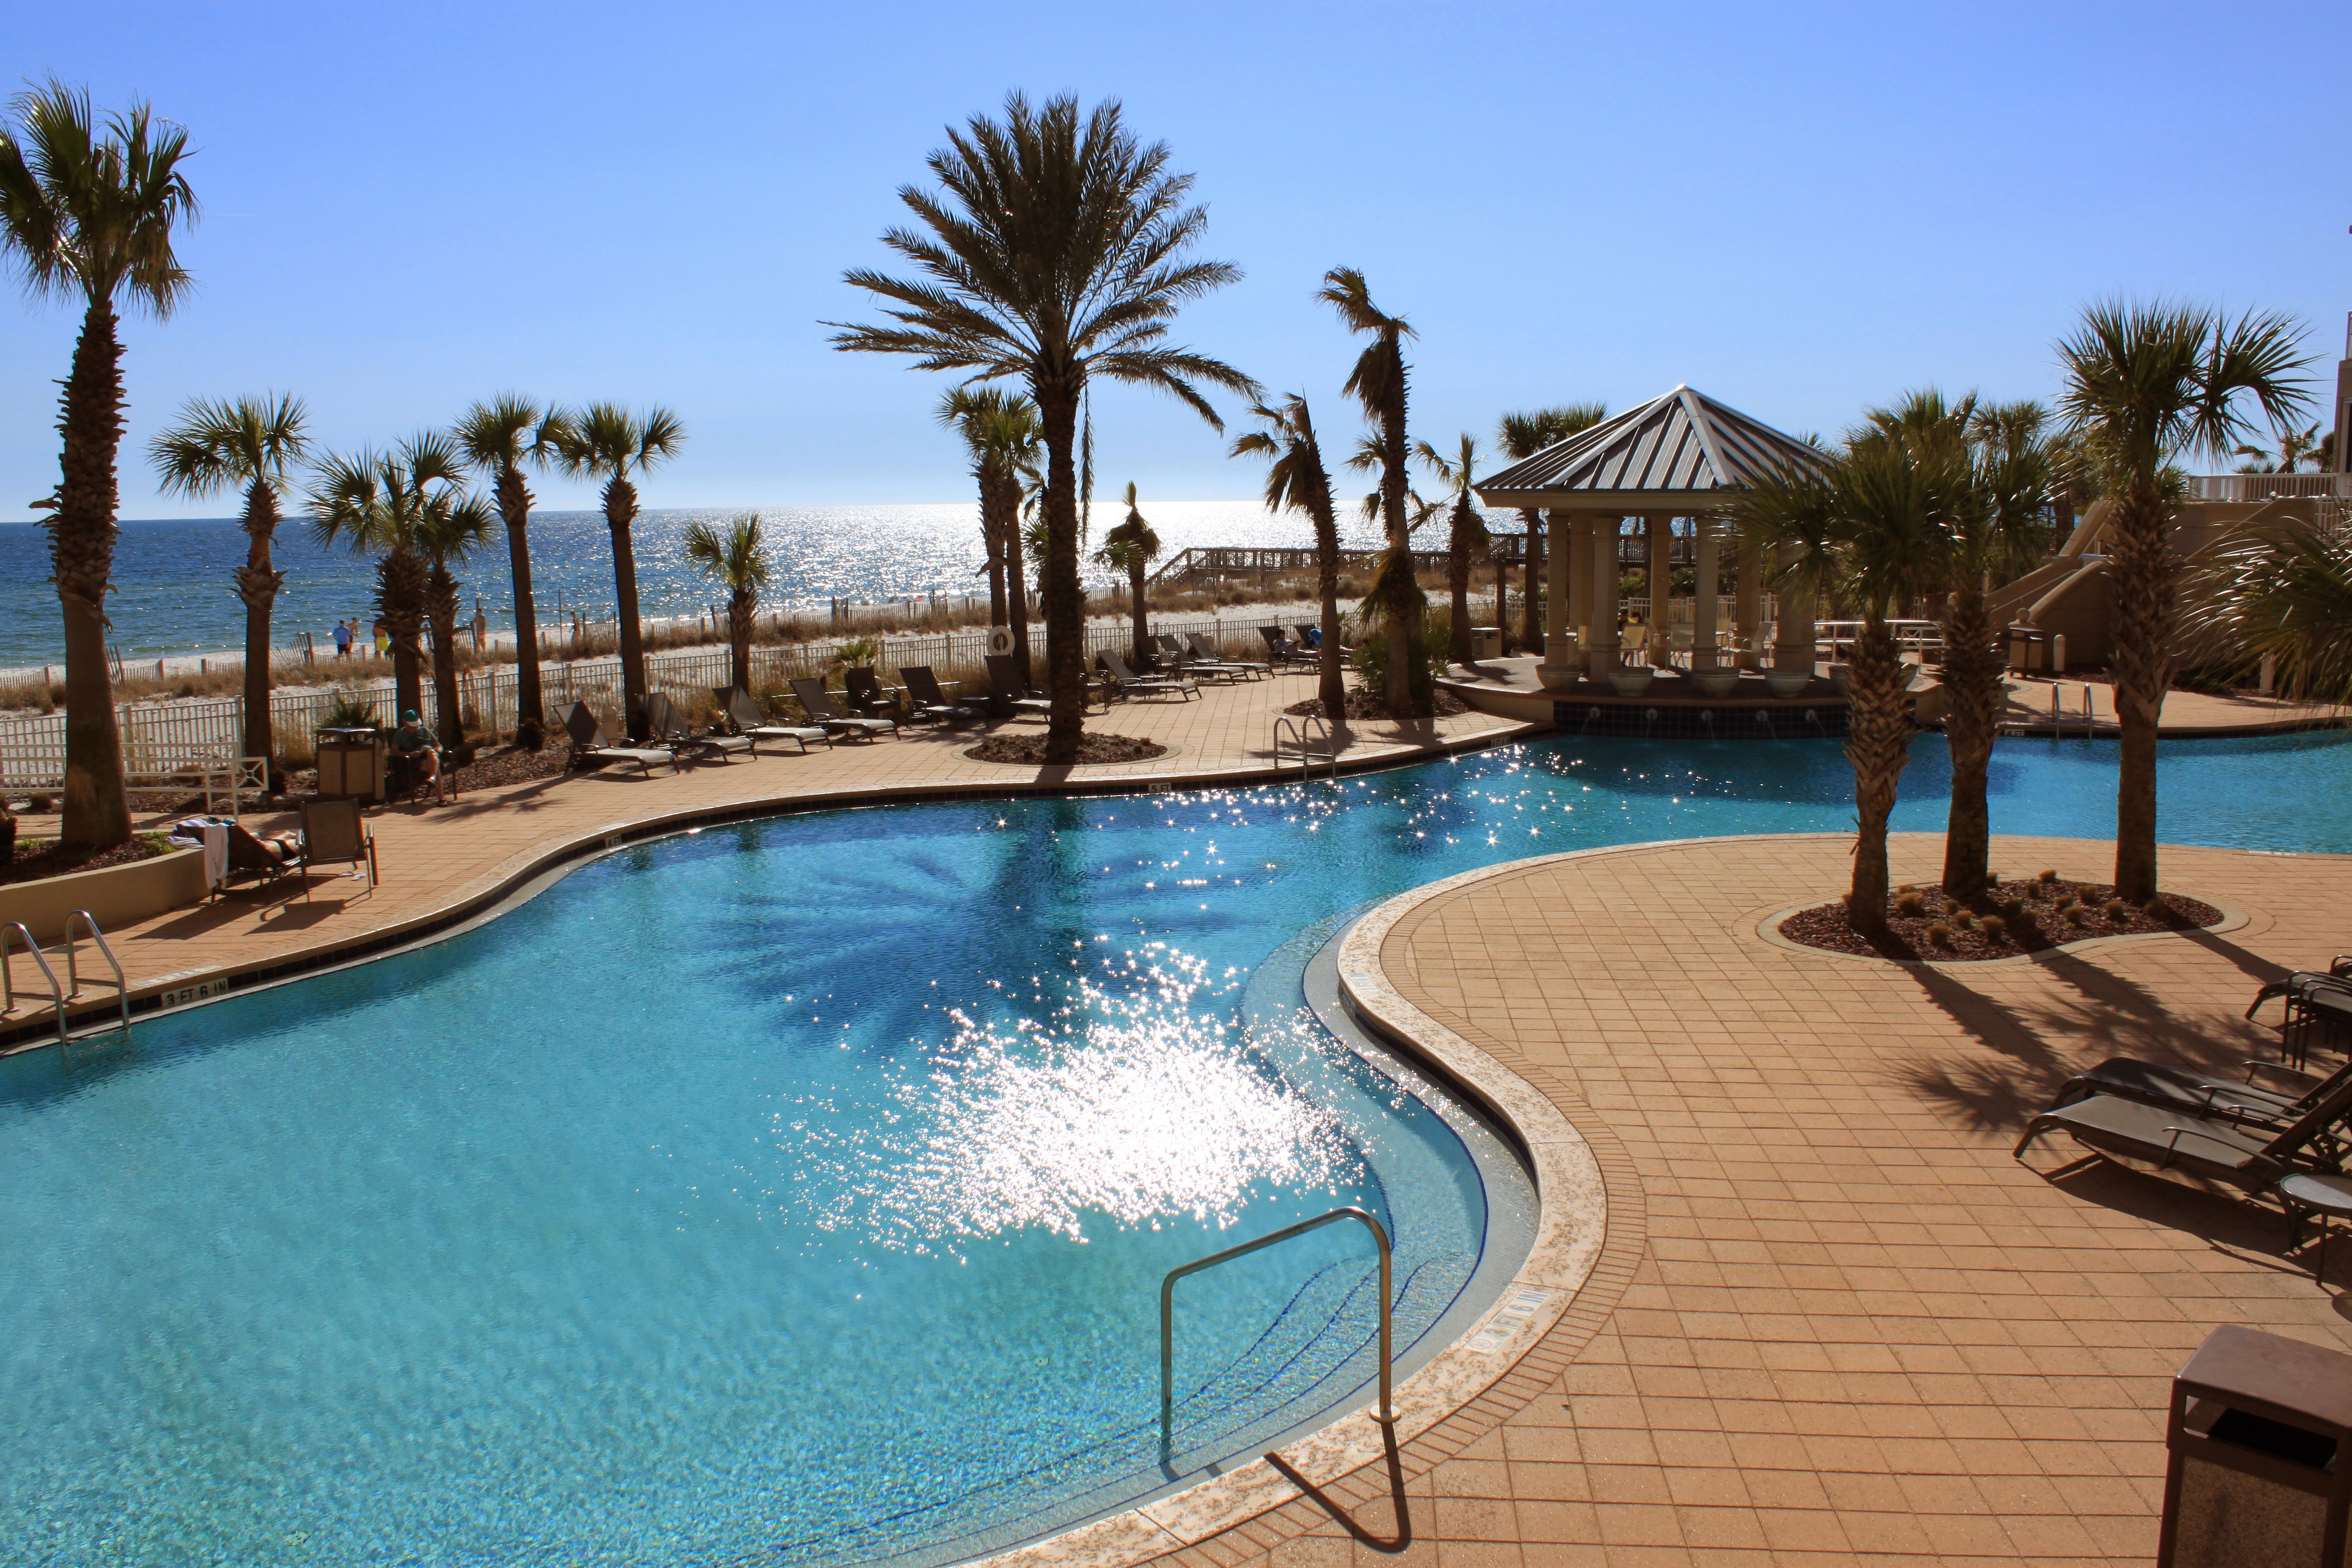 Beach Resort Rentals  Indigo East 1801  Luxury Coastal